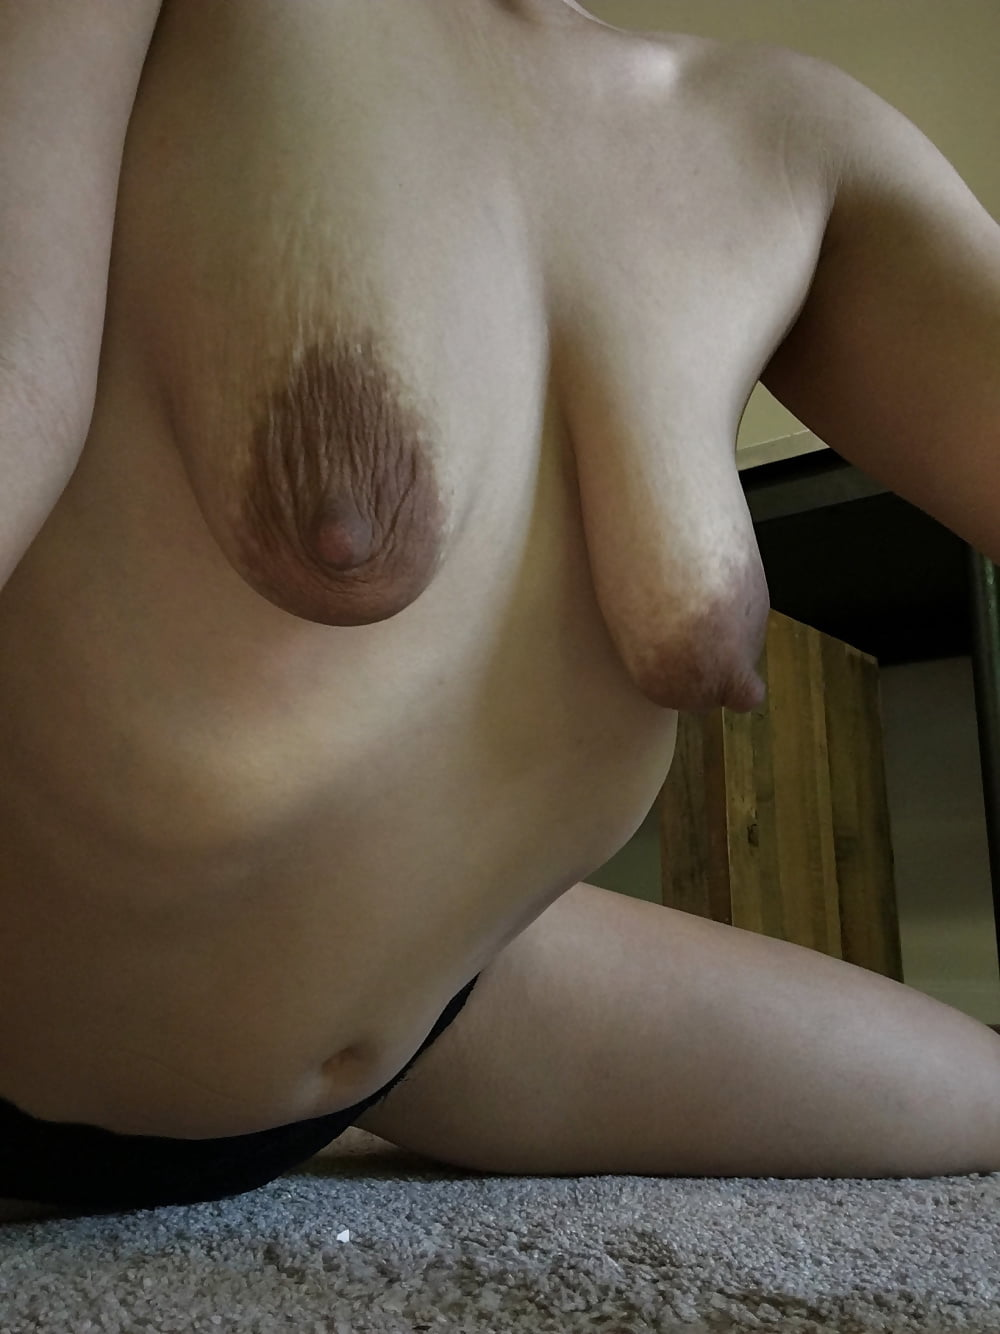 longest-nipples-porn-world-joanna-krupa-hot-desnuda